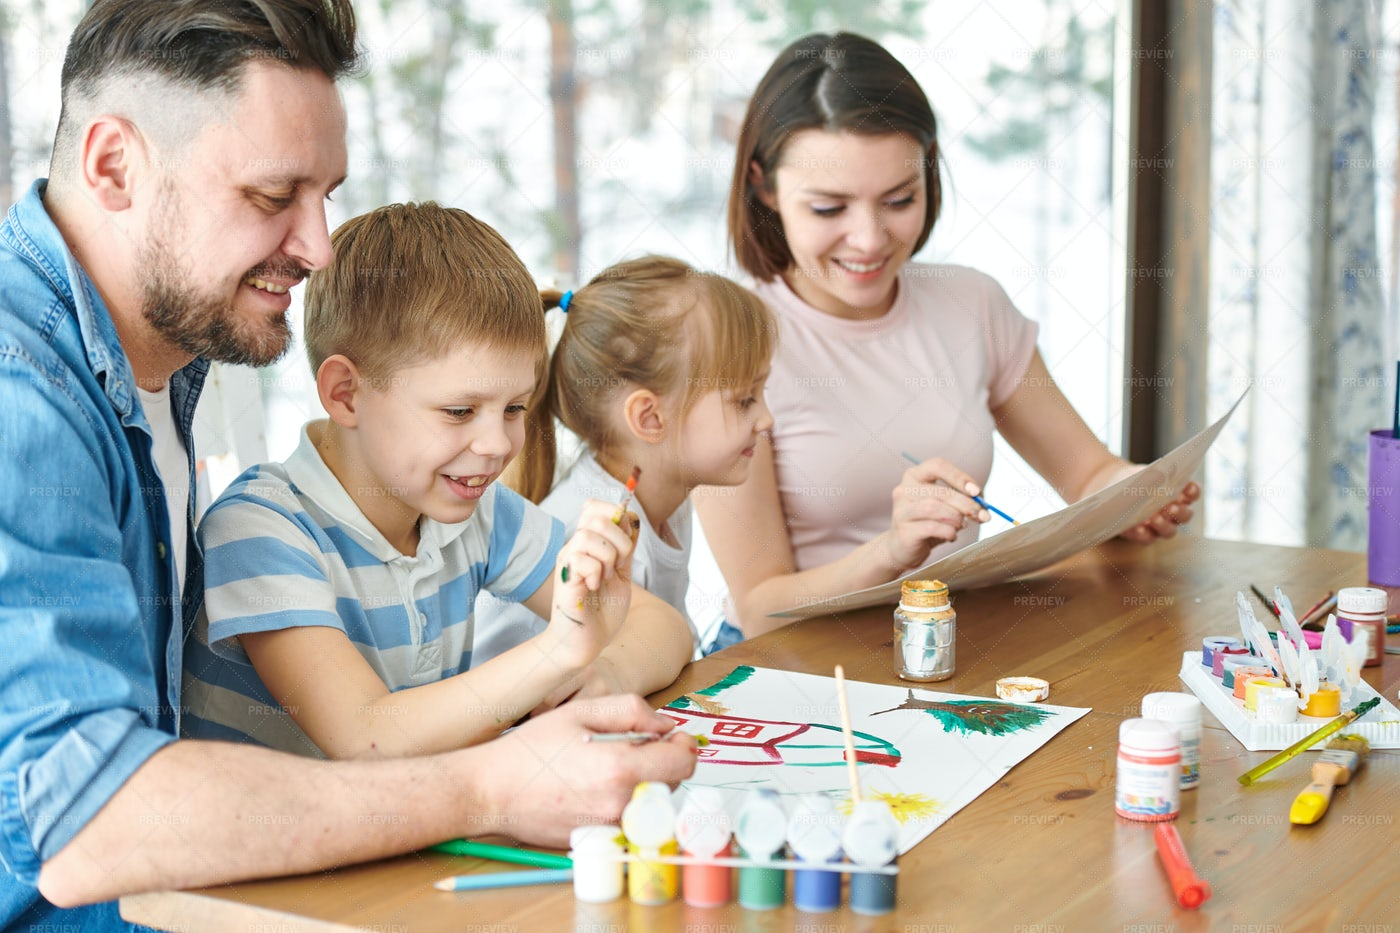 Family Art: Stock Photos